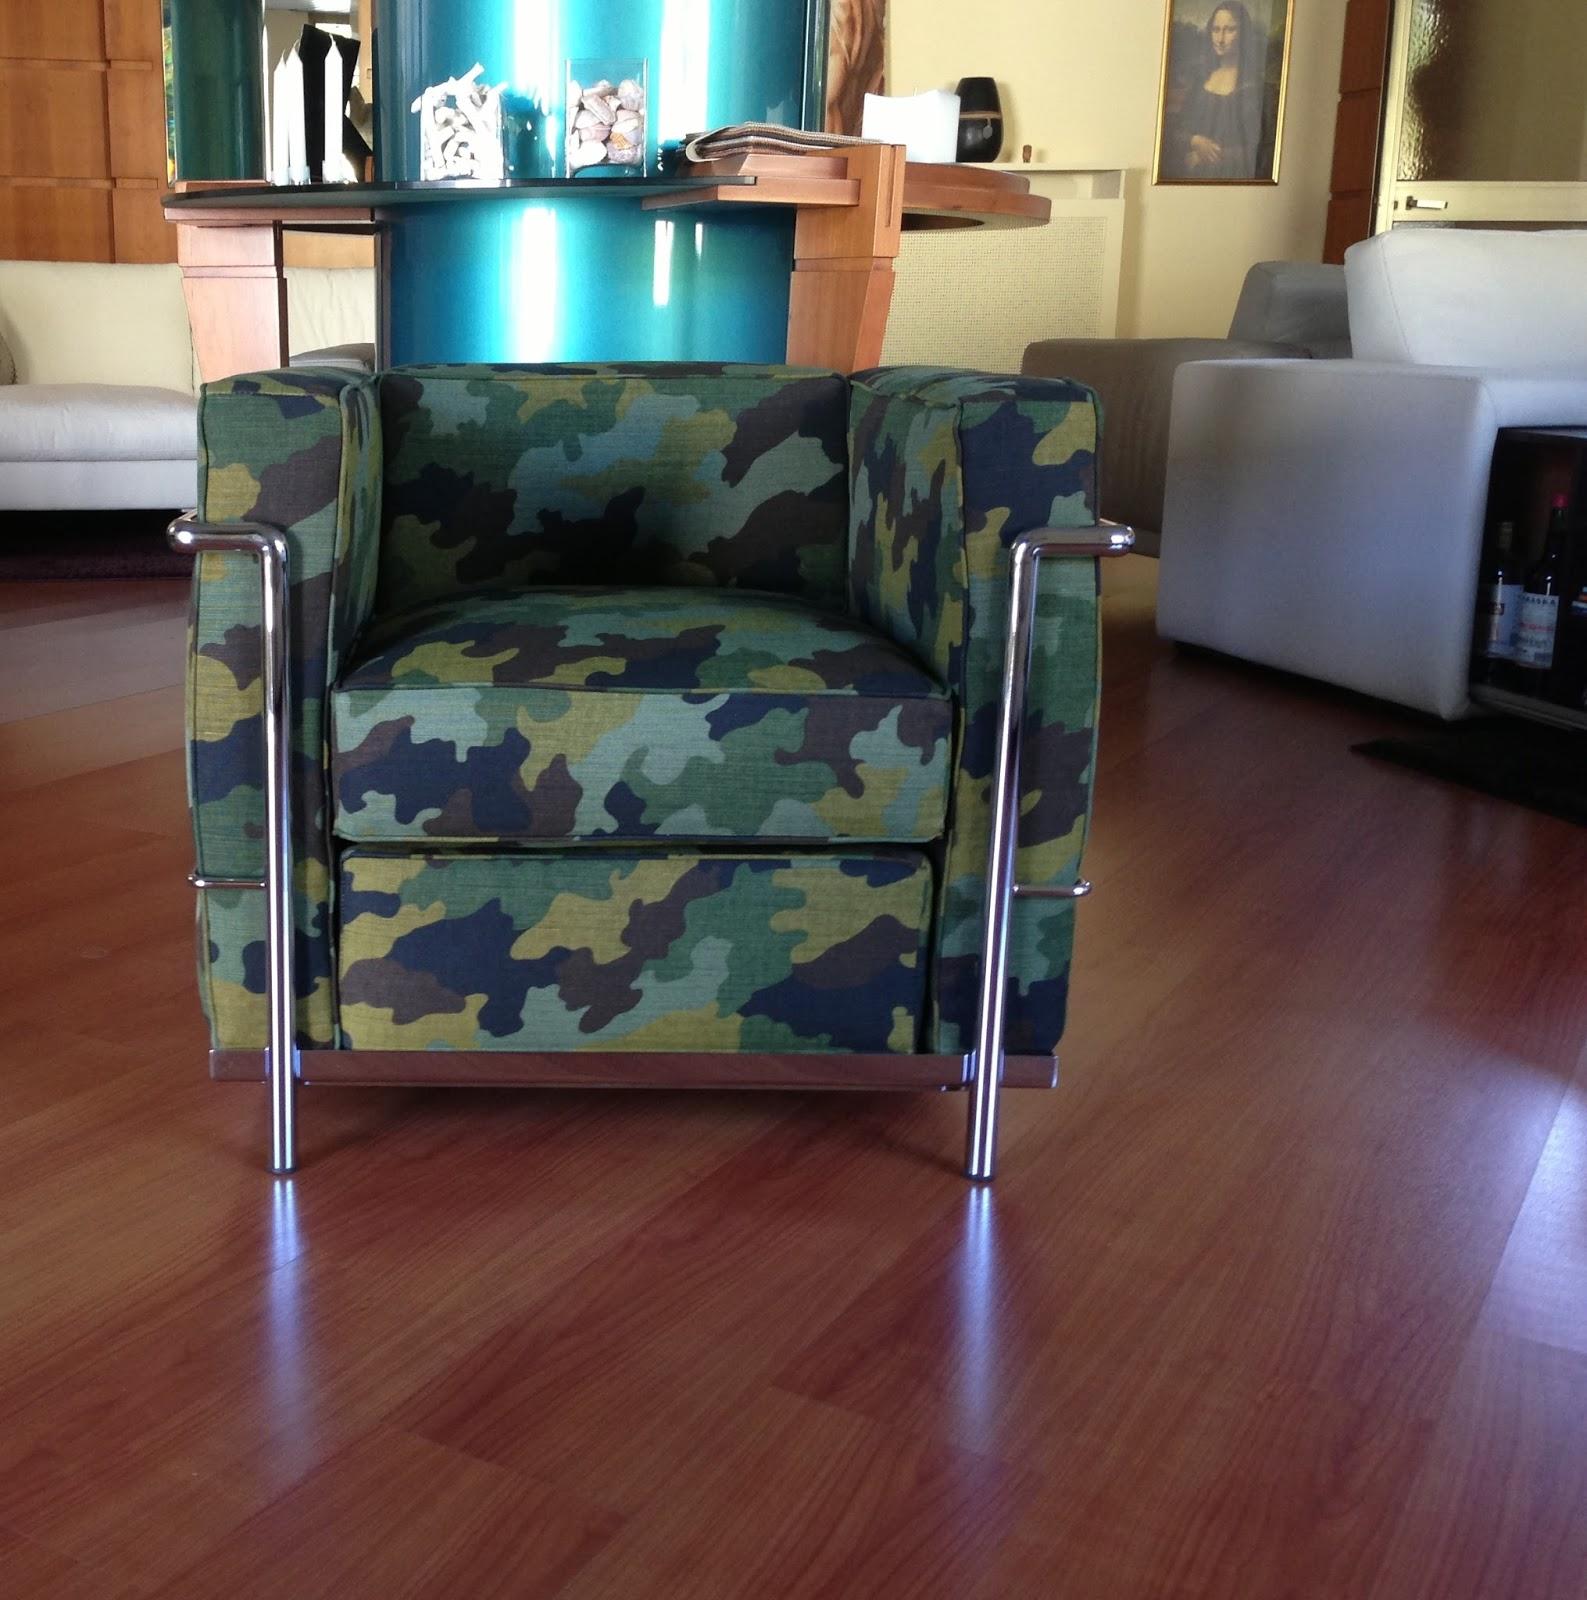 Poltrone dal rivestimento creativo tino mariani - Tessuto rivestimento divano ...